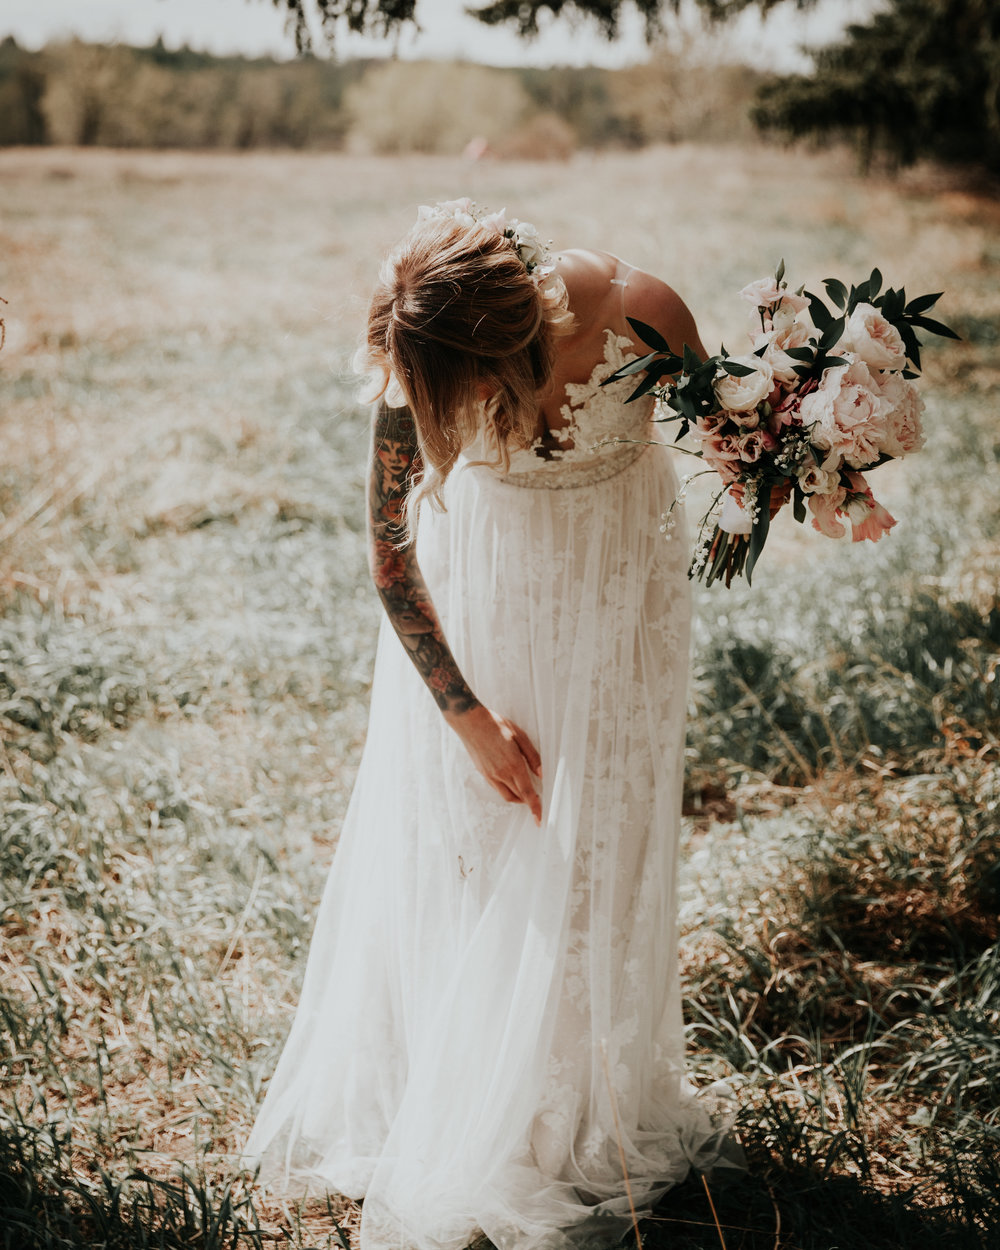 Walters Wedding Favourites - JayRMcDonald (7 of 18).JPG